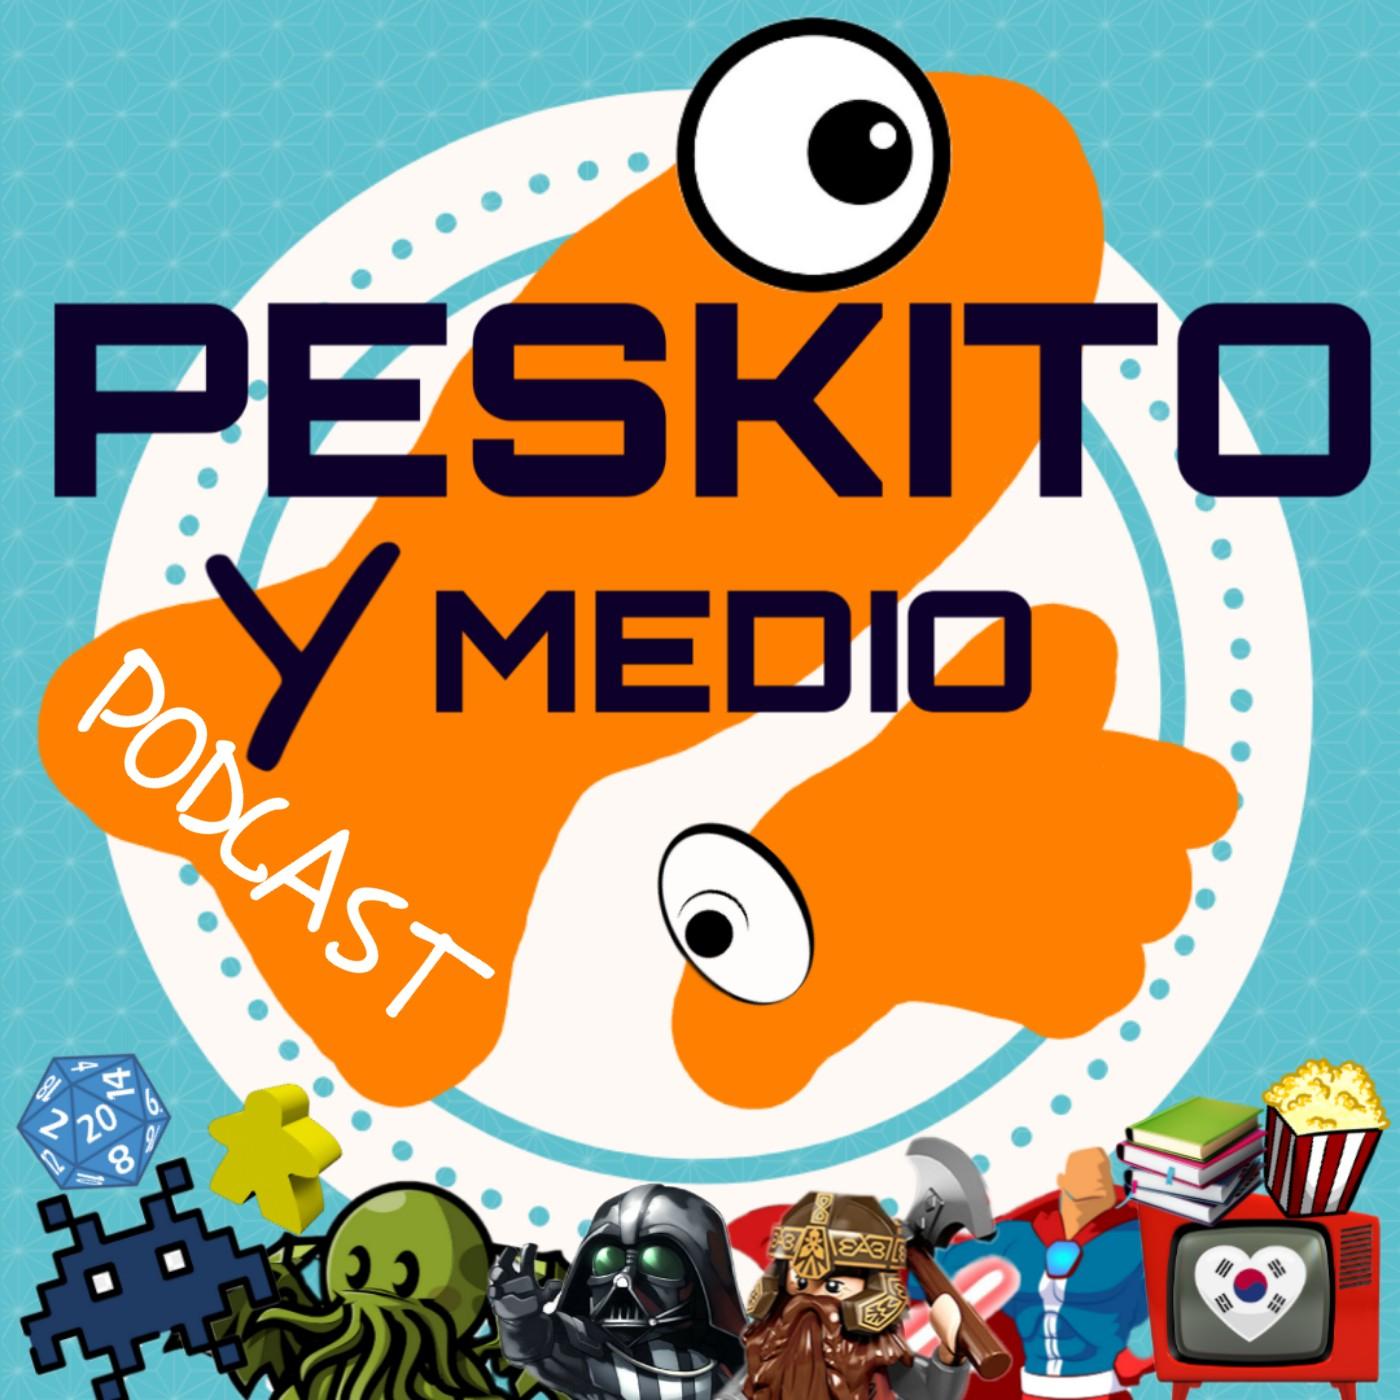 Logo del programa Peskito y Medio Podcast